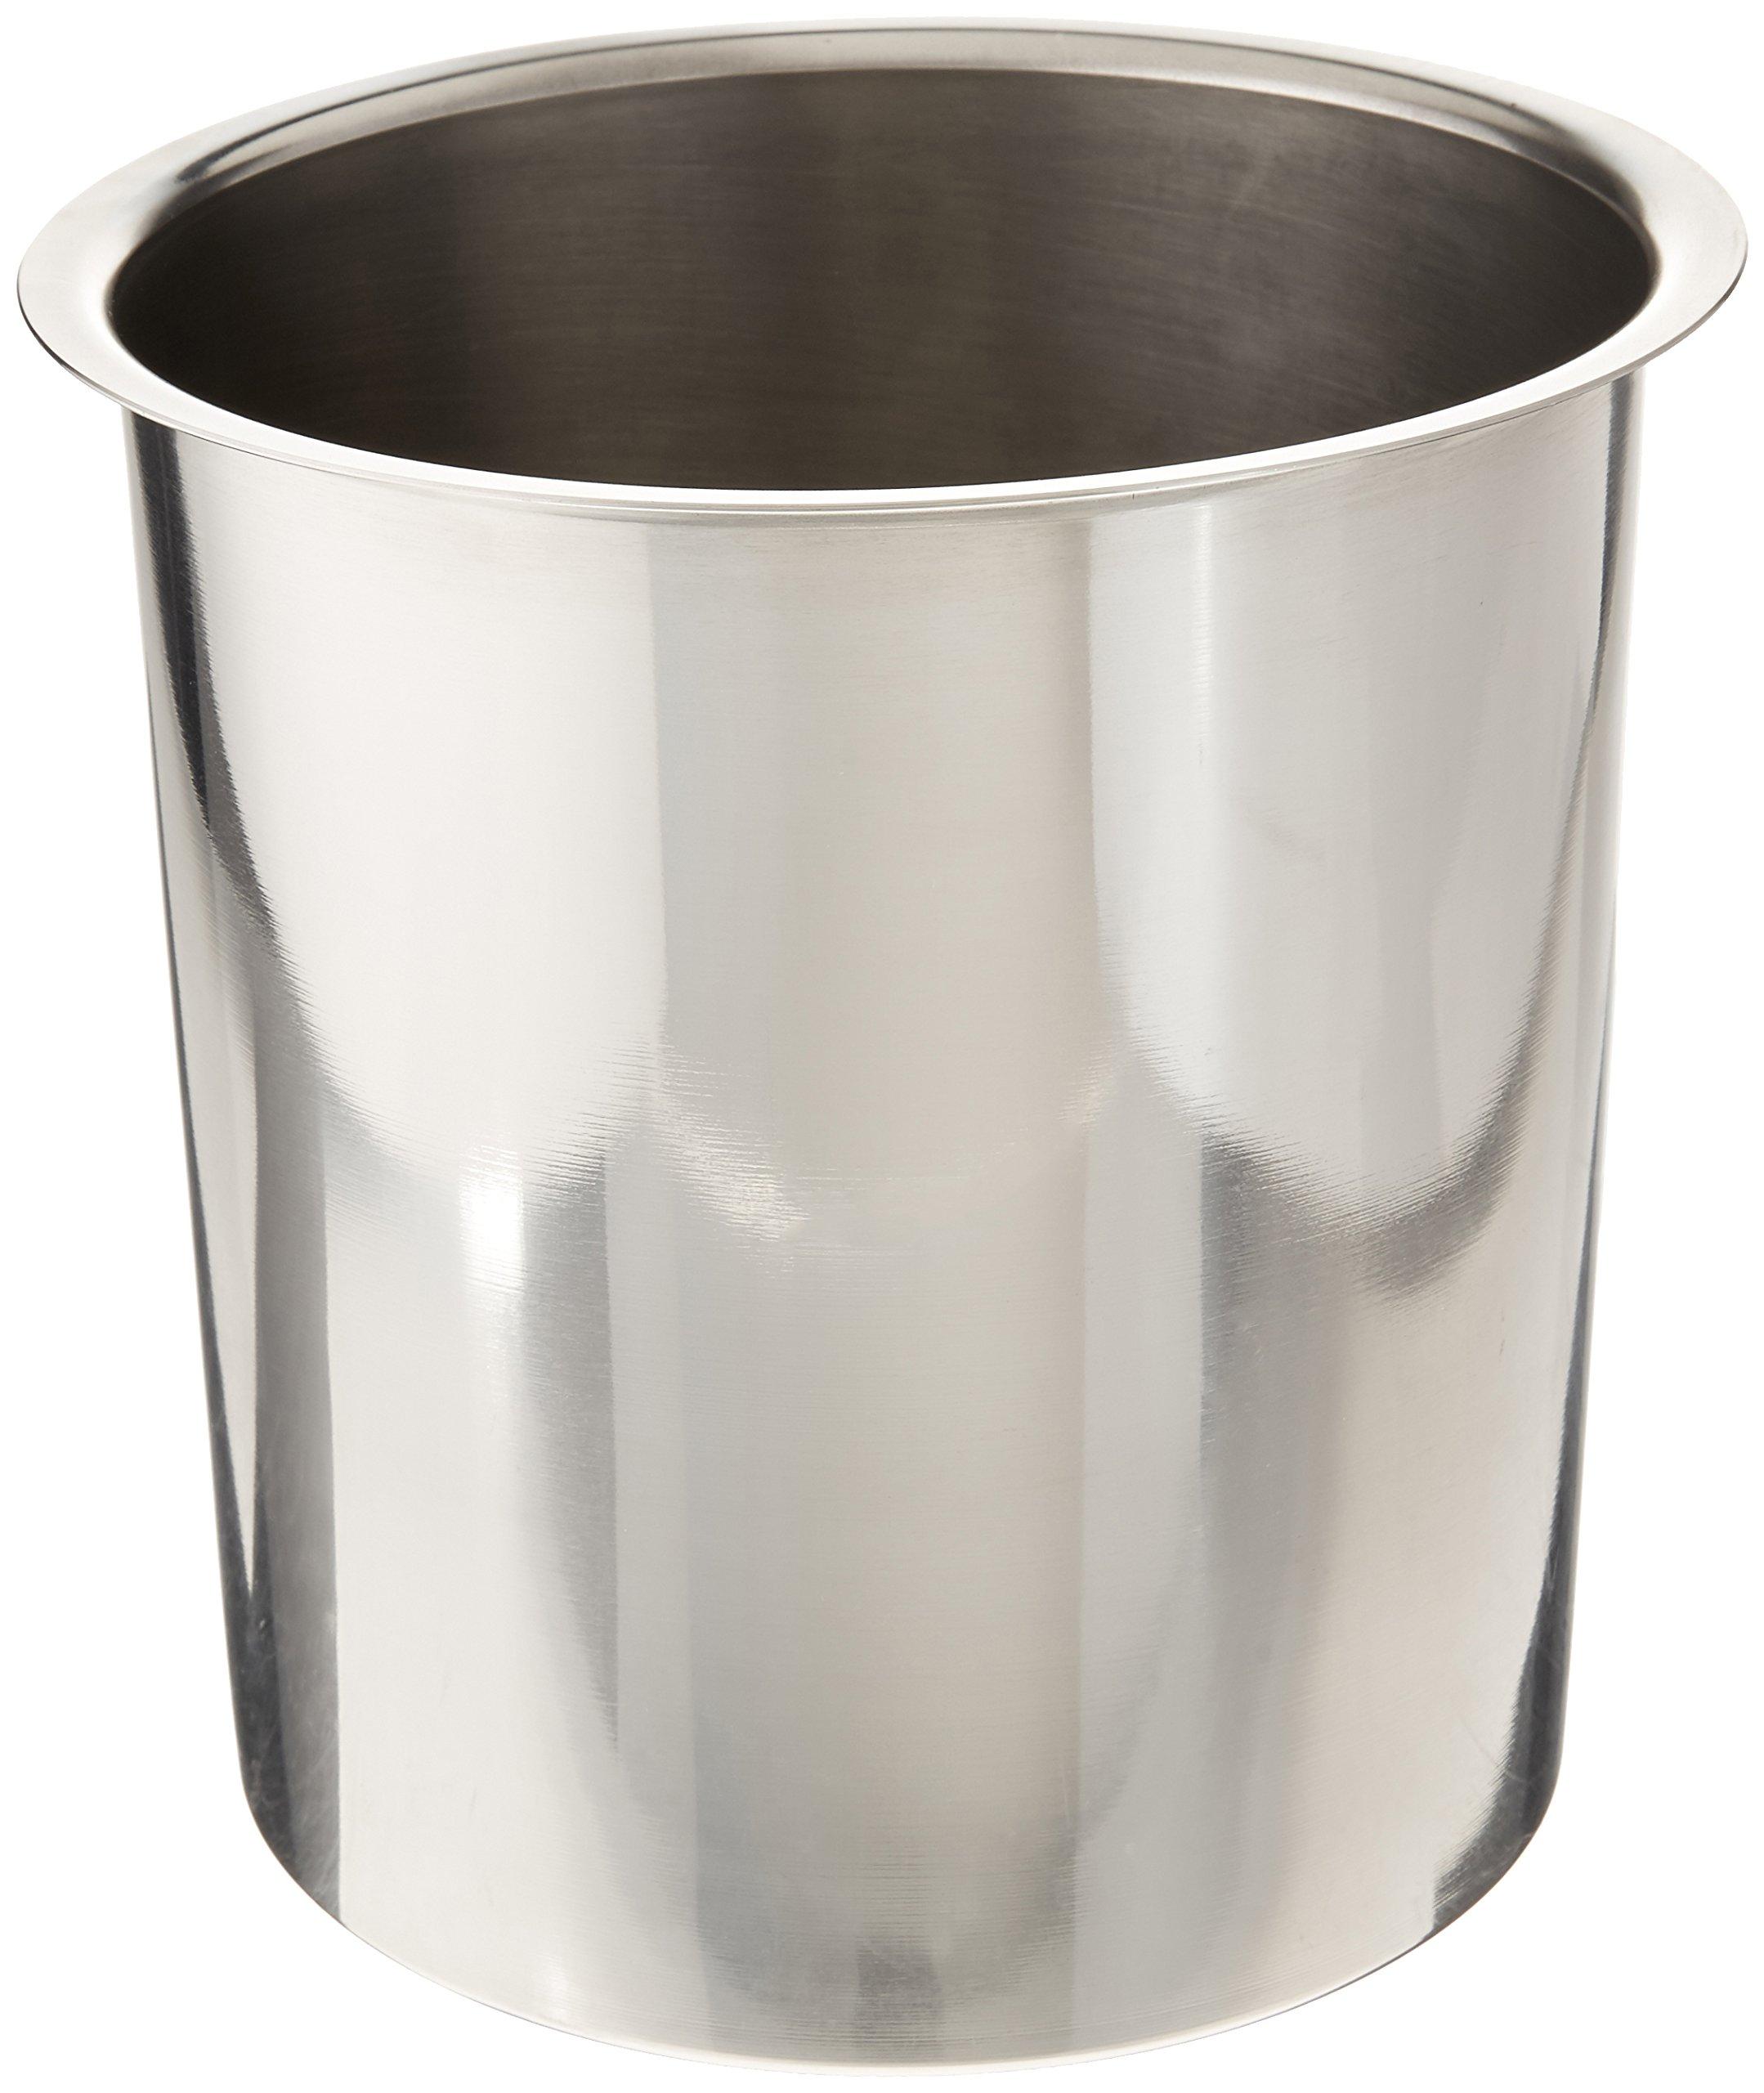 "Bain Marie Pot Size: 7.13"" H x 7.13"" W x 7.13"" D"